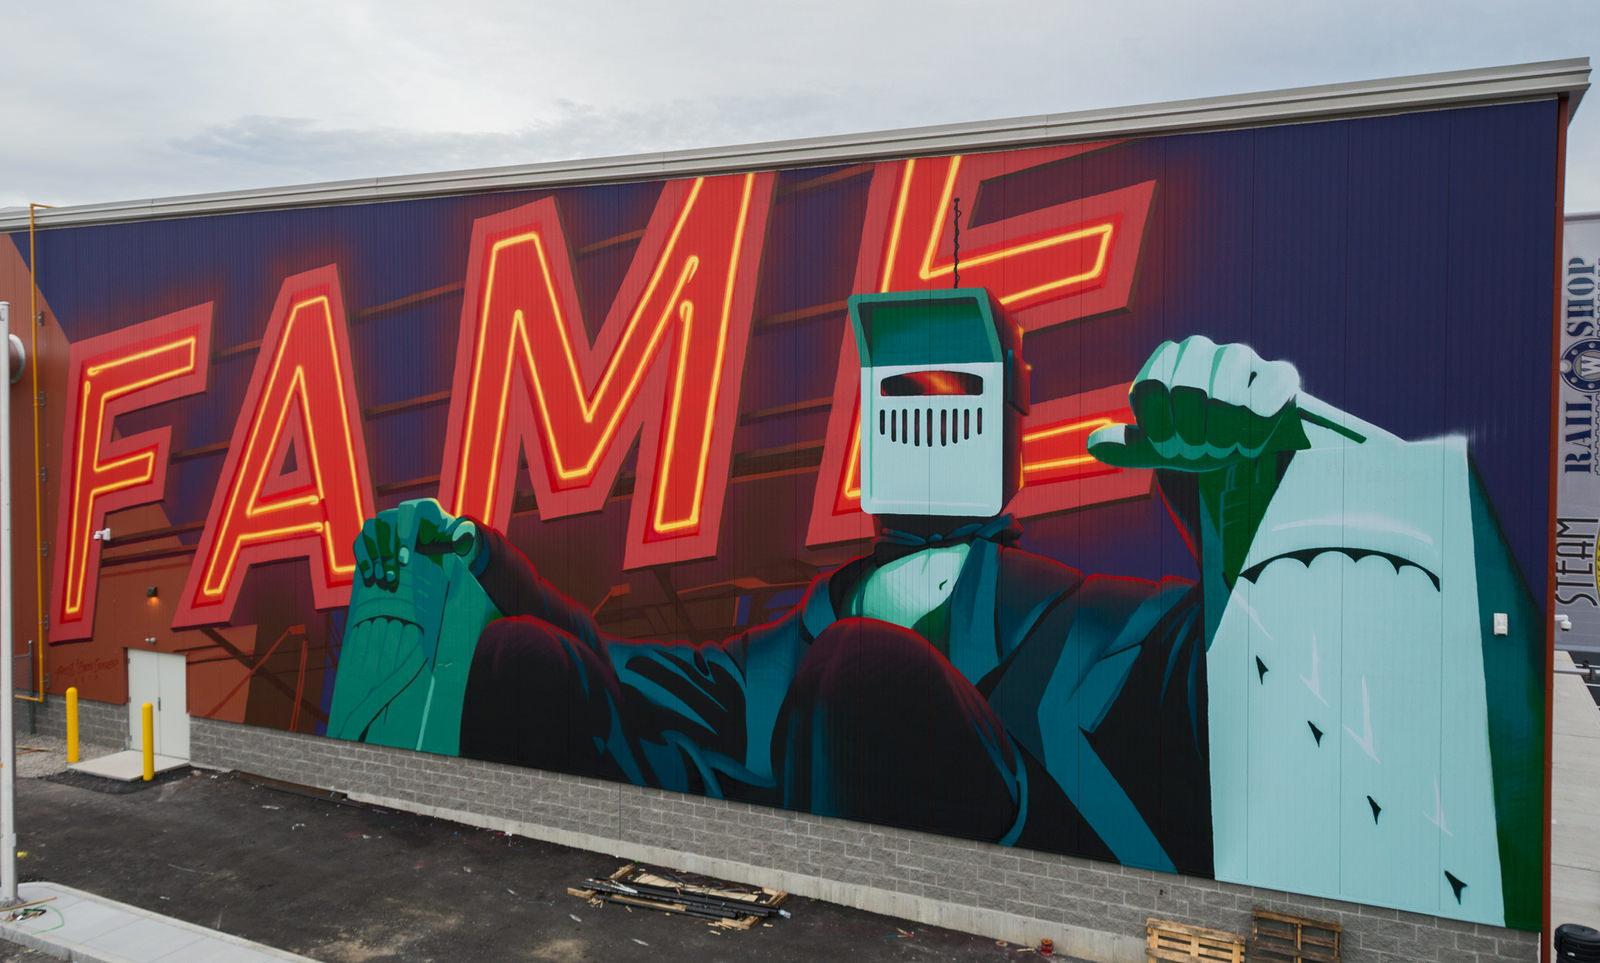 Ashop-Earth Crusher-Exterior mural-Massachusetts-2017